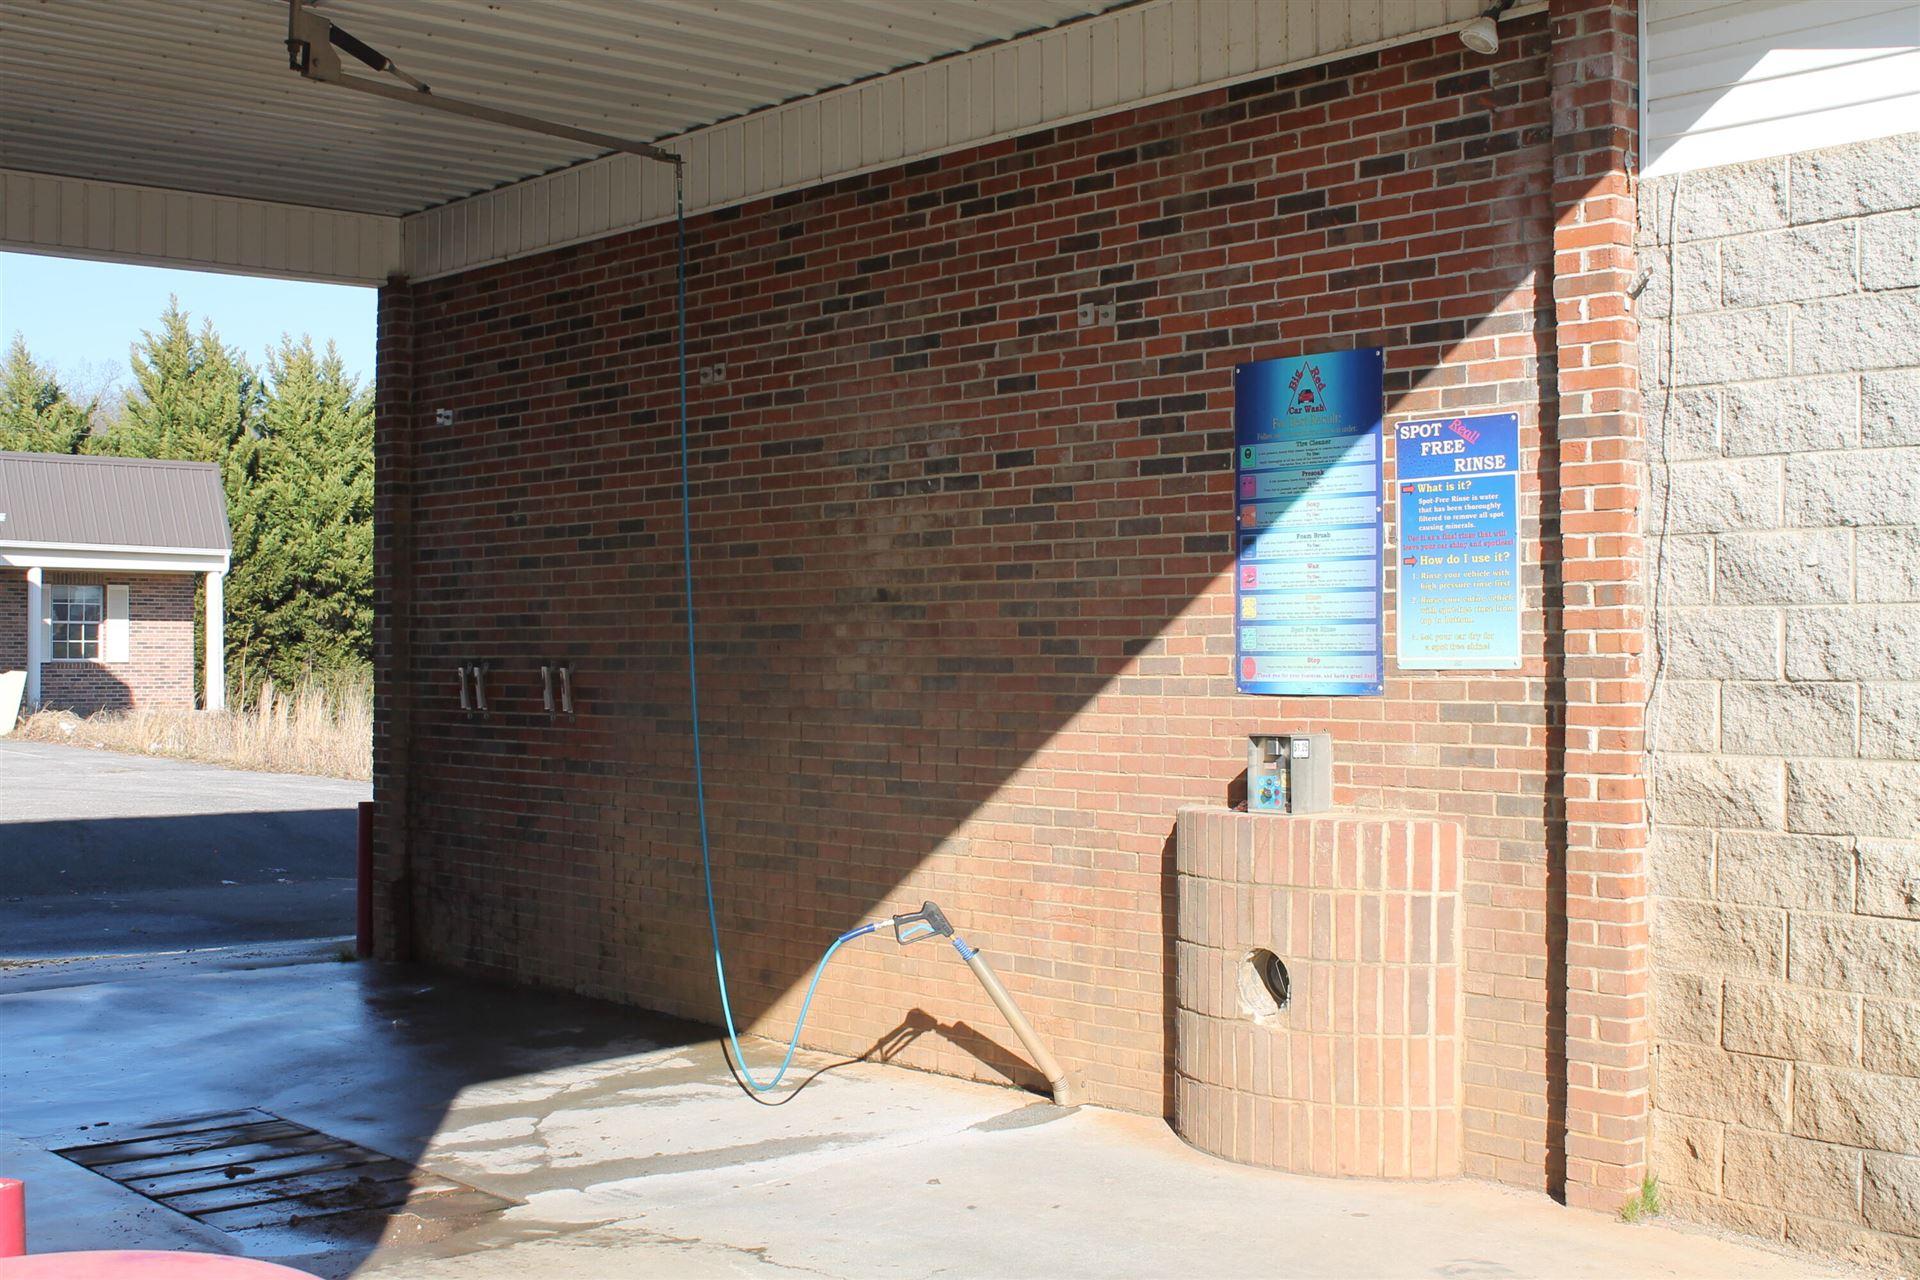 Photo of 1269 Carding Machine Rd, Loudon, TN 37774 (MLS # 1143940)